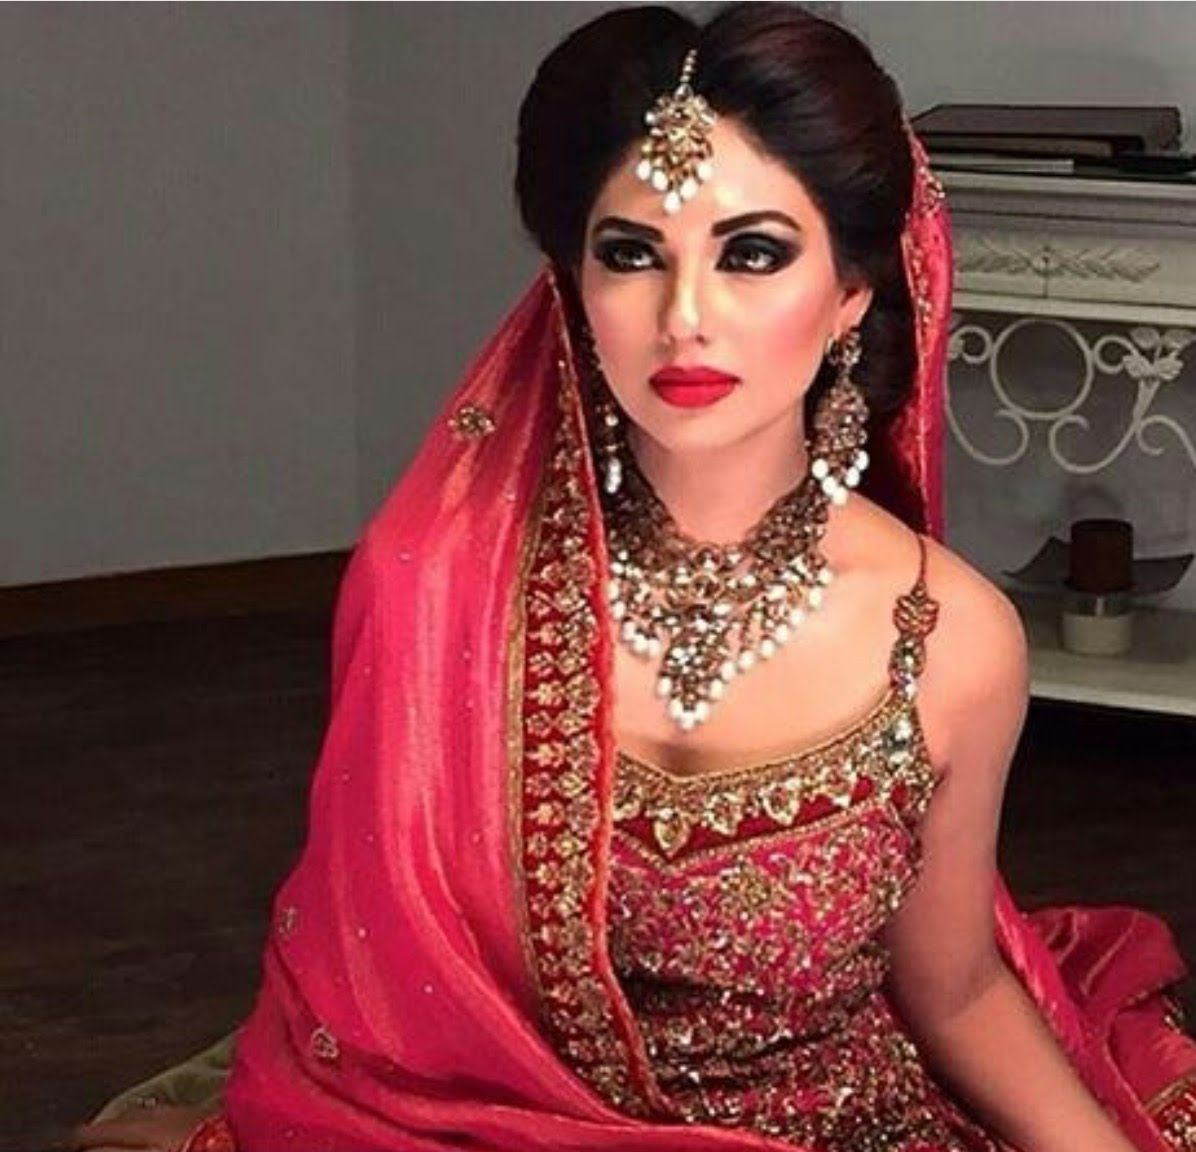 Wedding Hairstyle Pakistani: Pin Von Top Pakistan Auf Top Pakistan